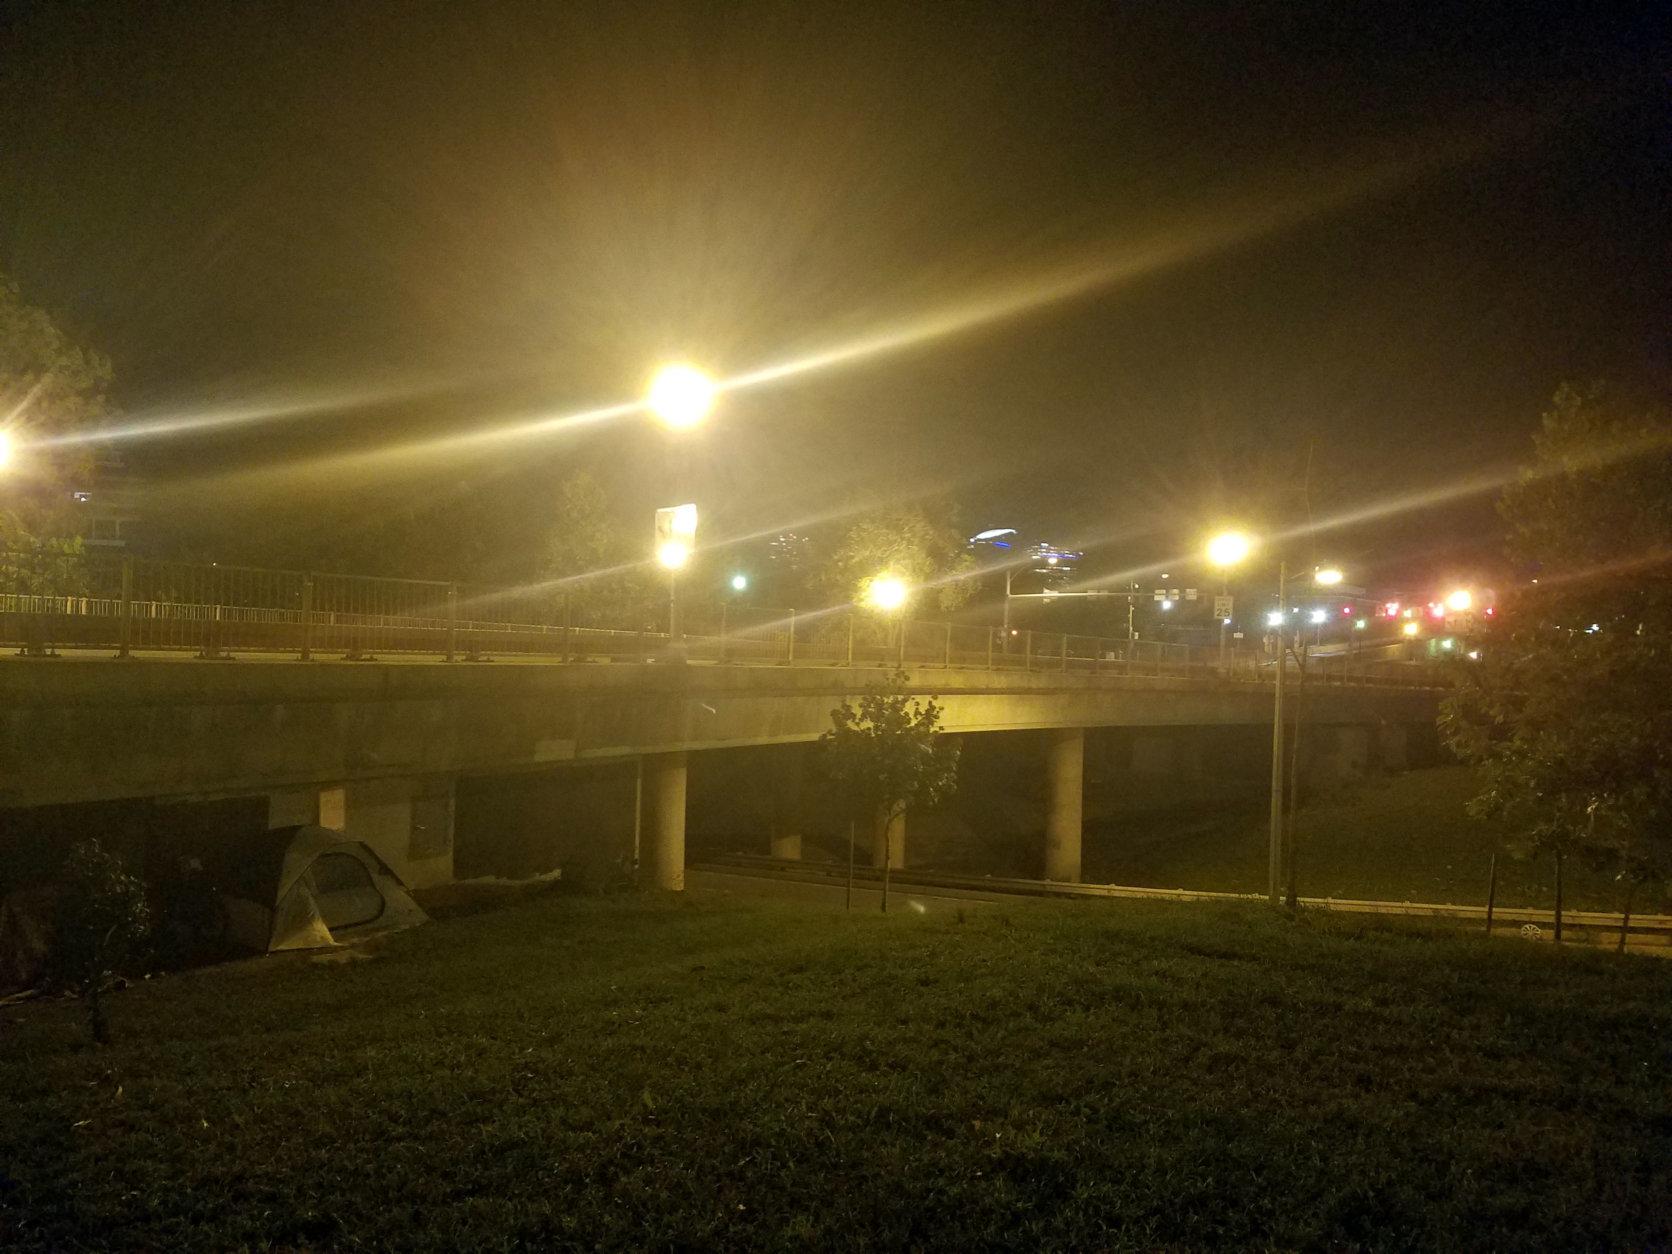 Tents under the K Street Bridge. (WTOP/Will Vitka)